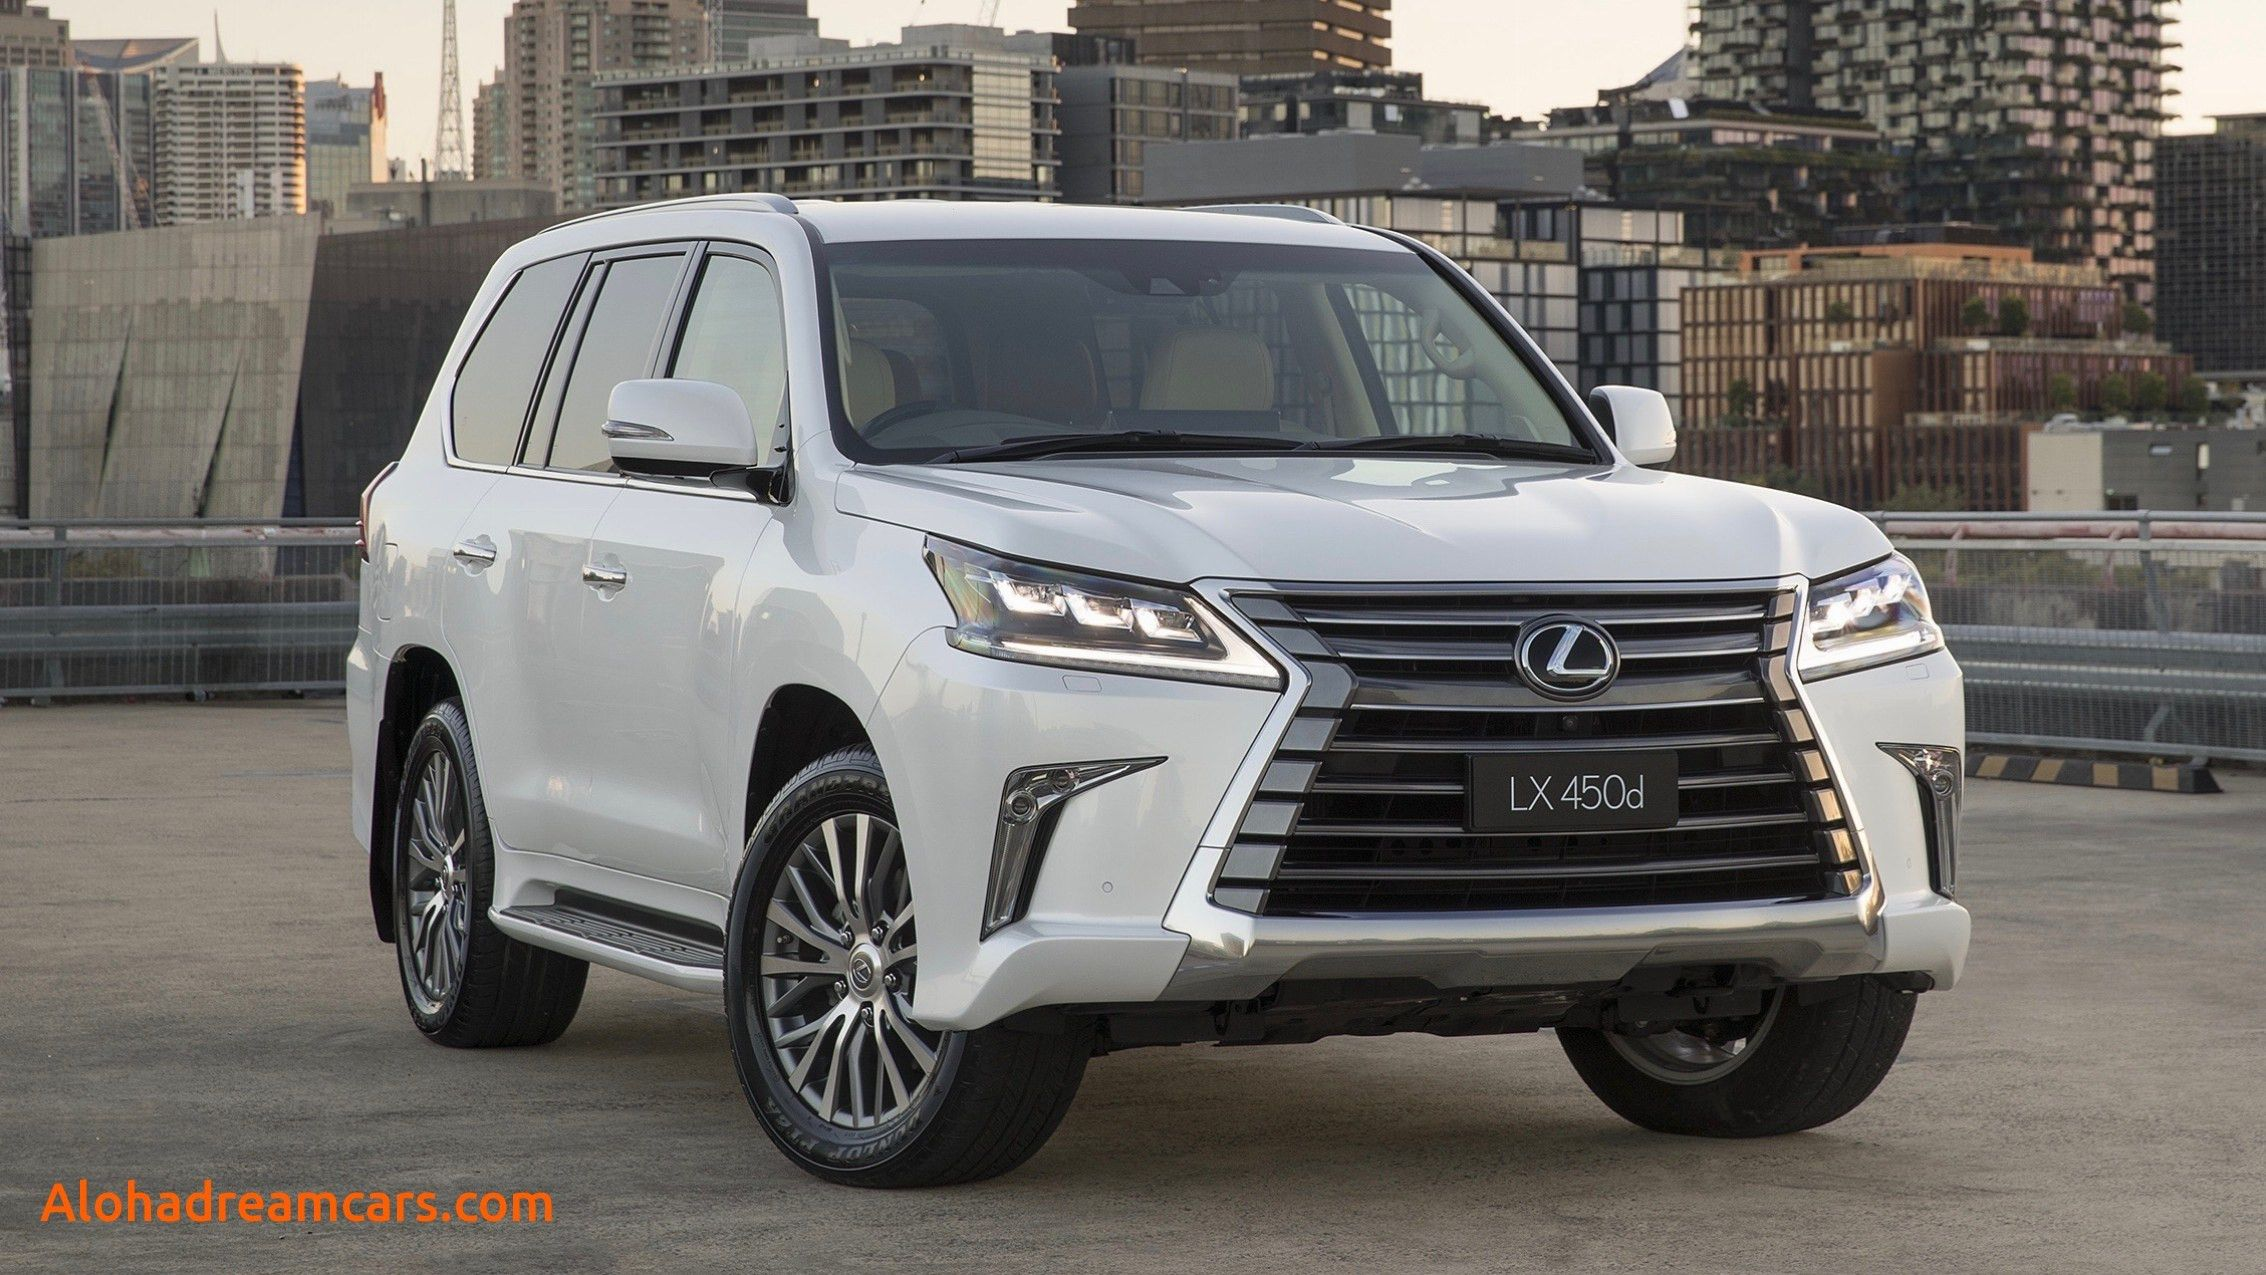 Kelebihan Toyota Lexus 2018 Top Model Tahun Ini